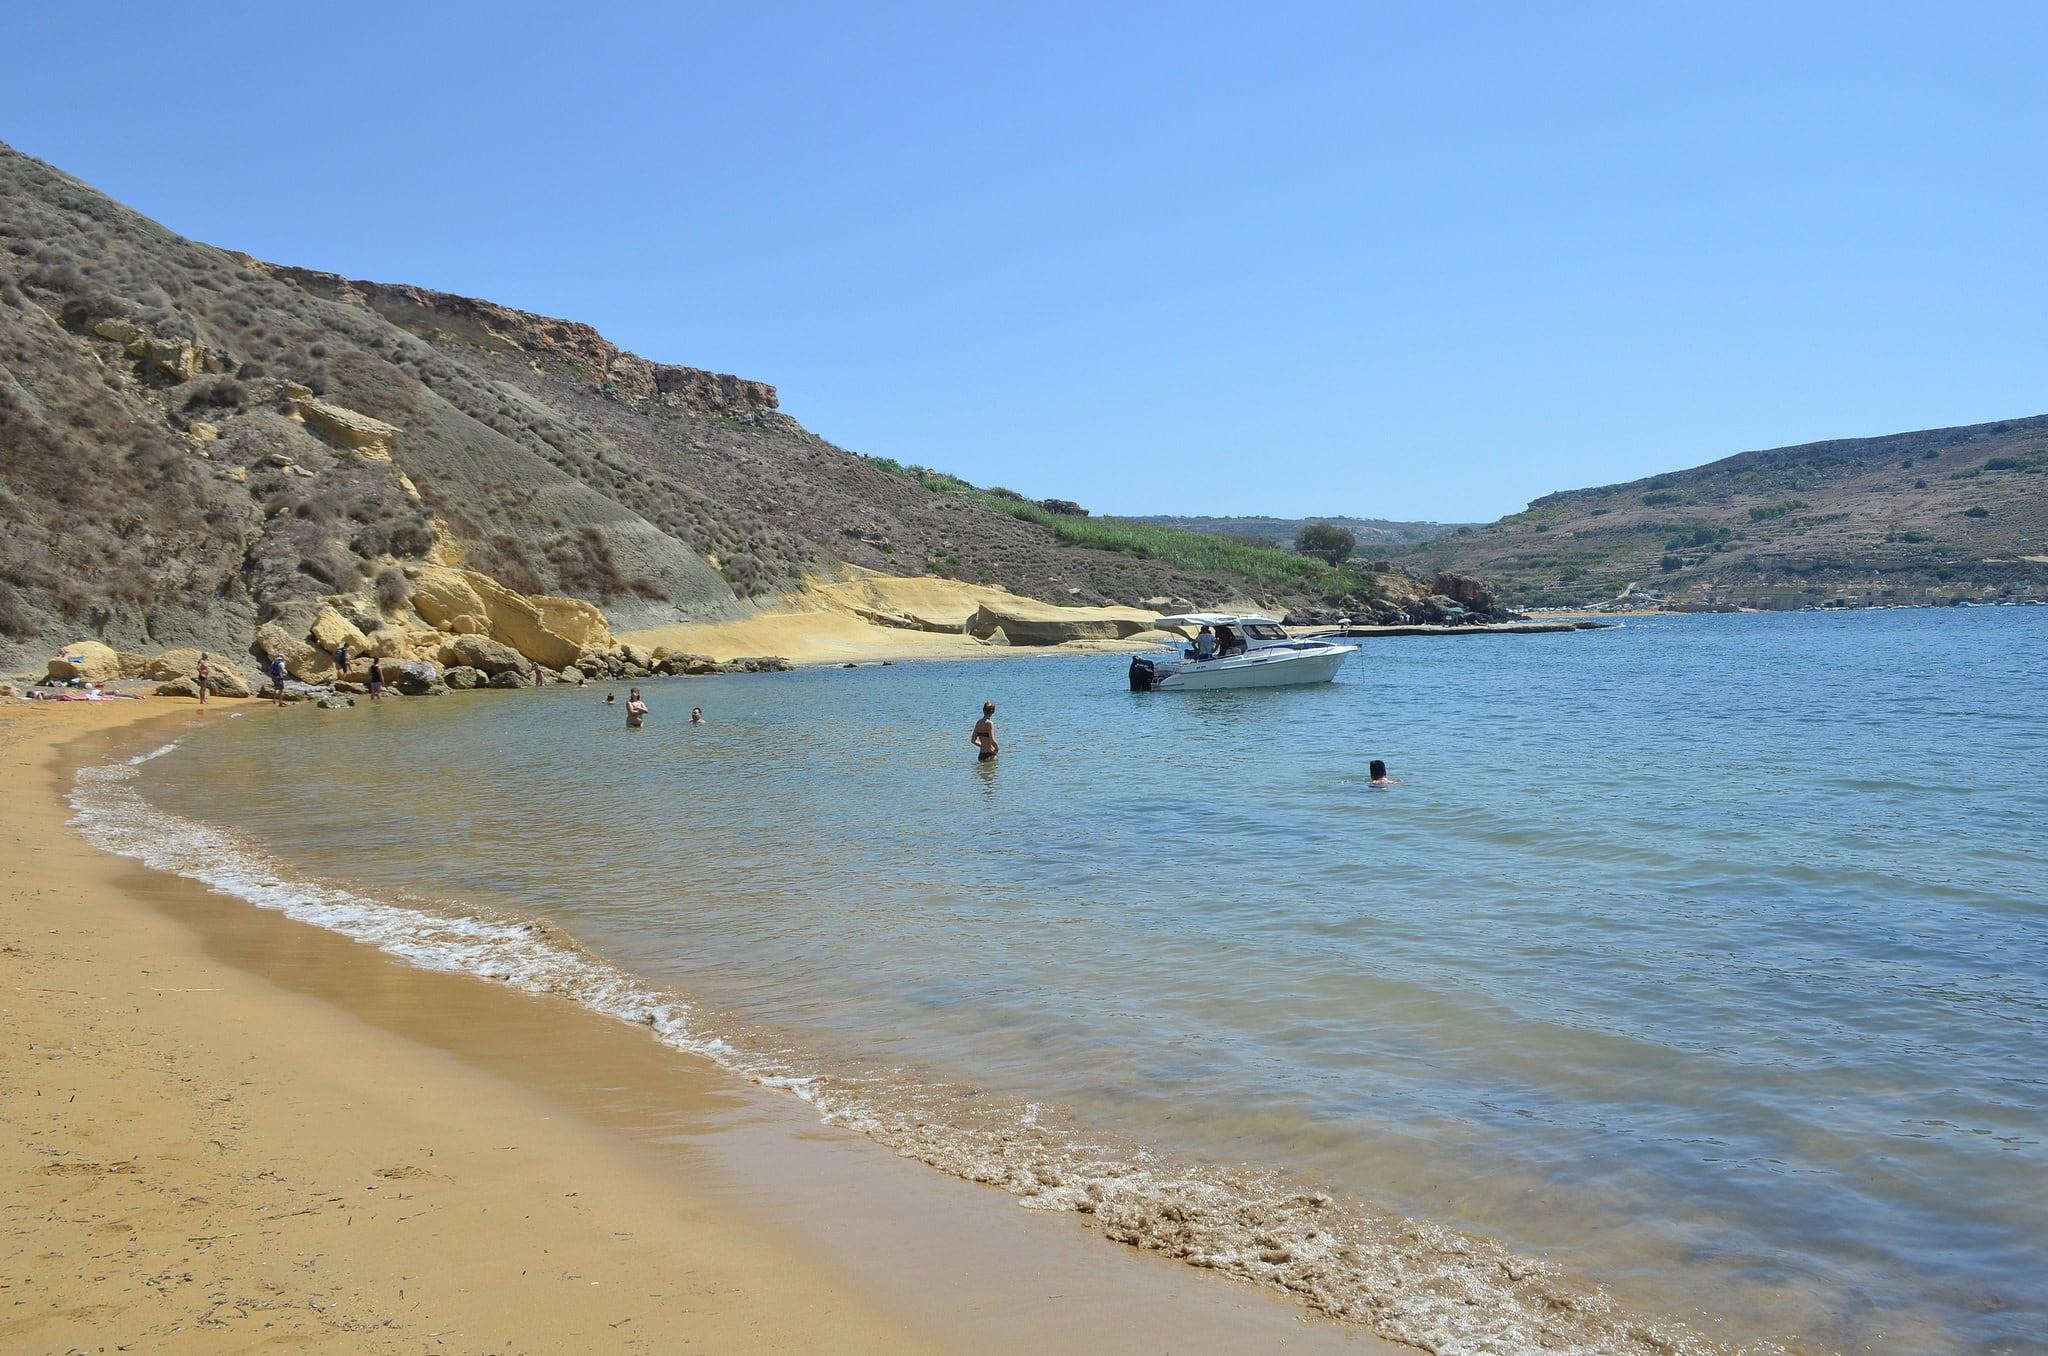 Għajn Tuffieħa 的形象. mer malta malte baie paradisebay méditérannée crique baymalta baieduparadis paradisemalta